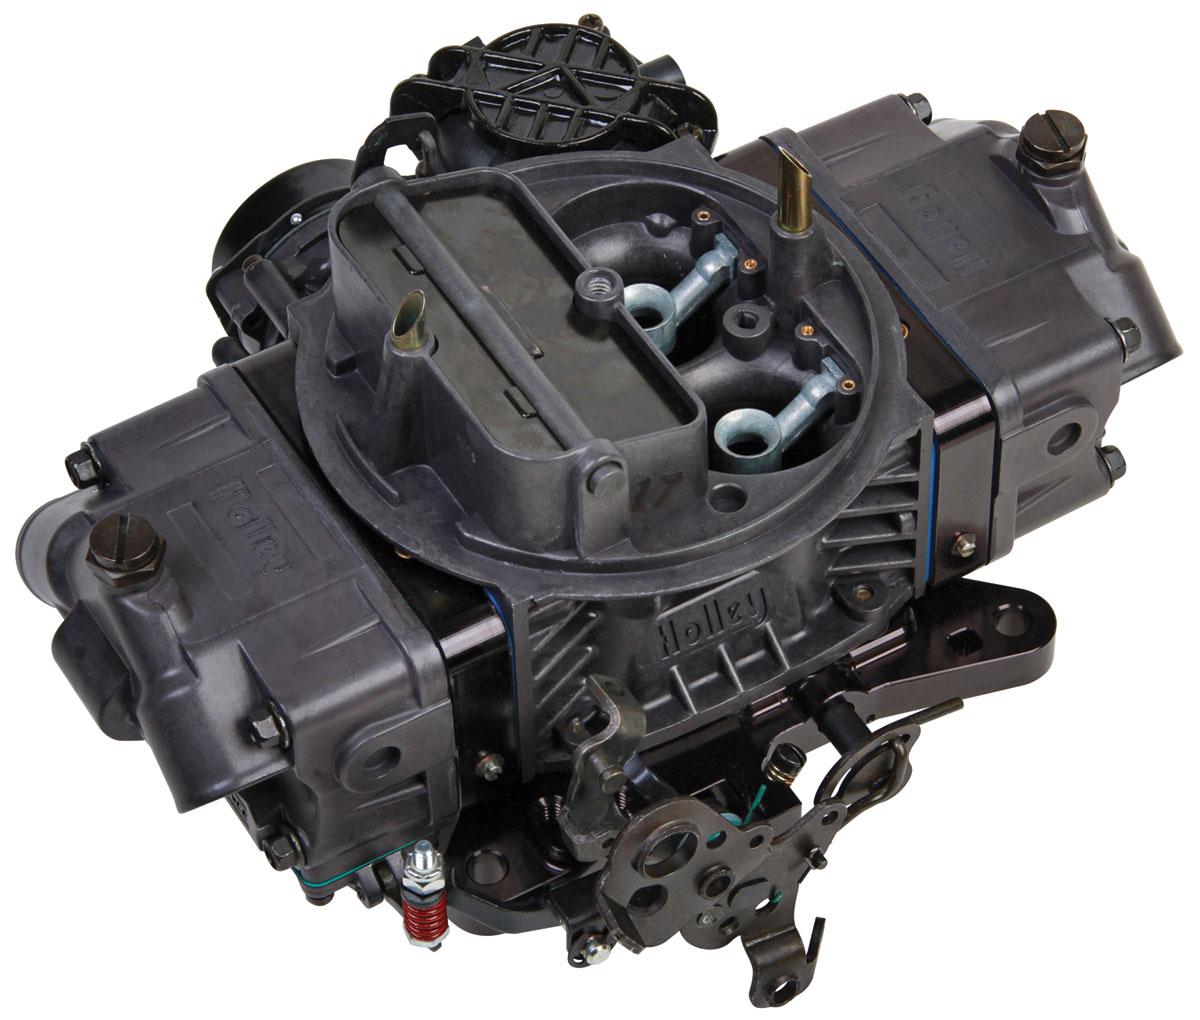 Photo of Carburetors, Holley, Ultra Street Avenger 770 Cfm black billet aluminum finish